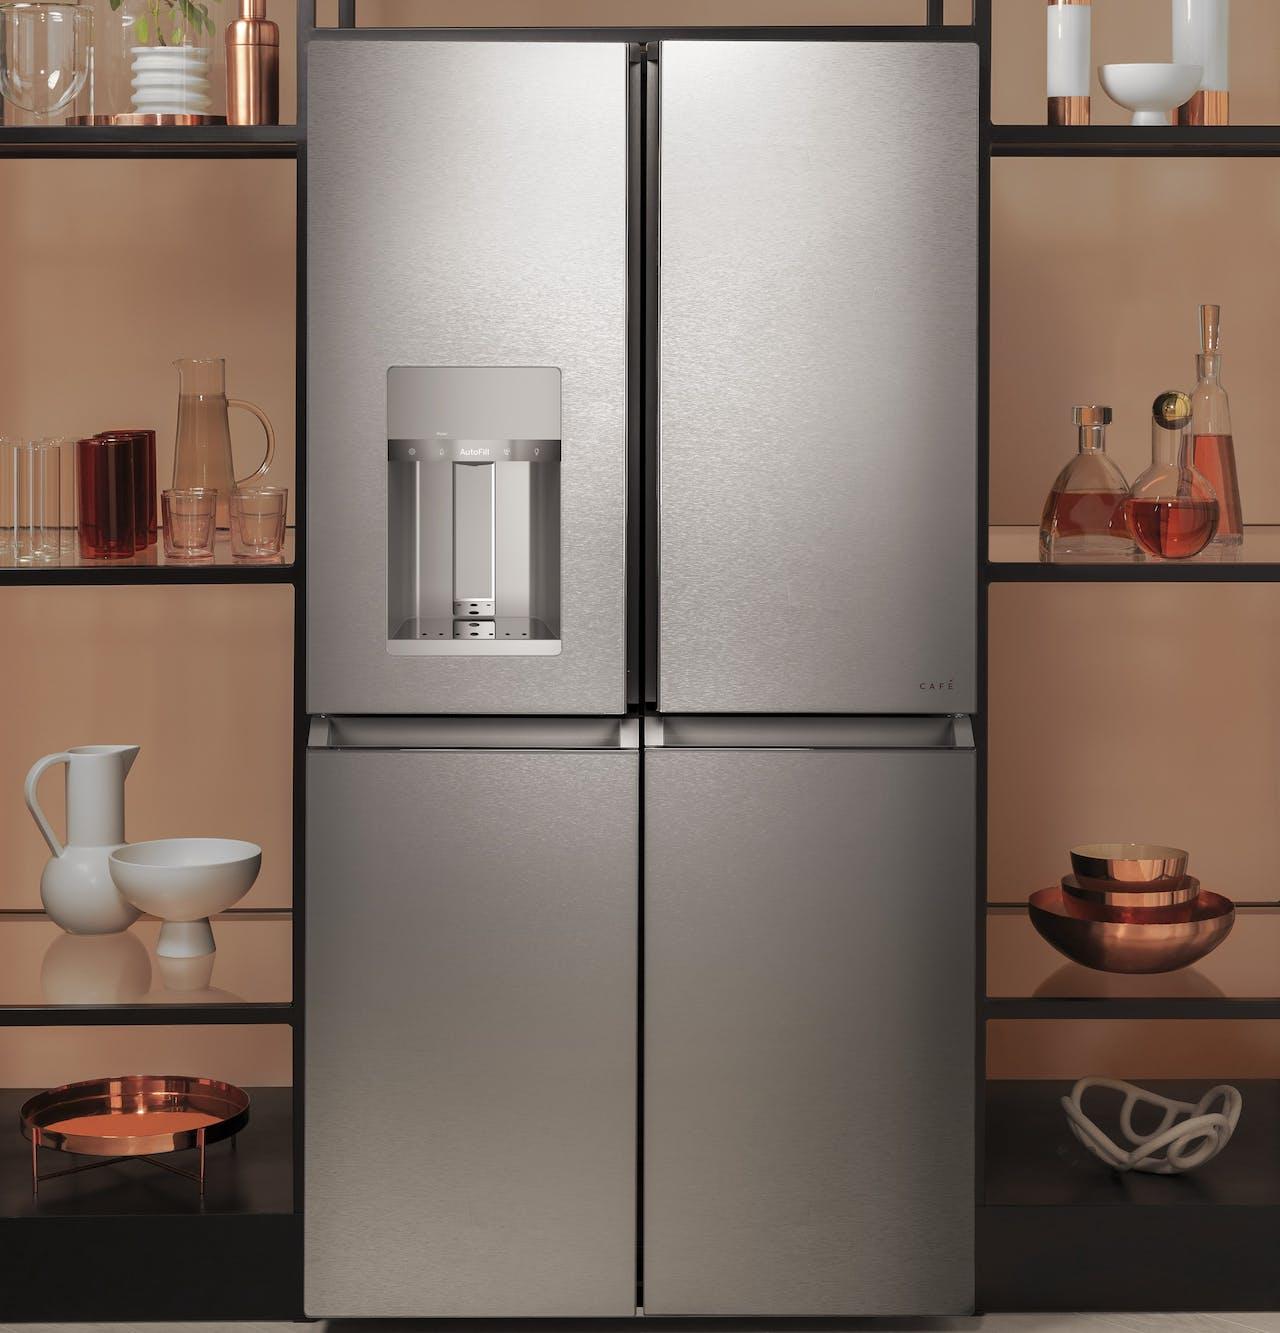 Smart Quad-Door Refrigerator